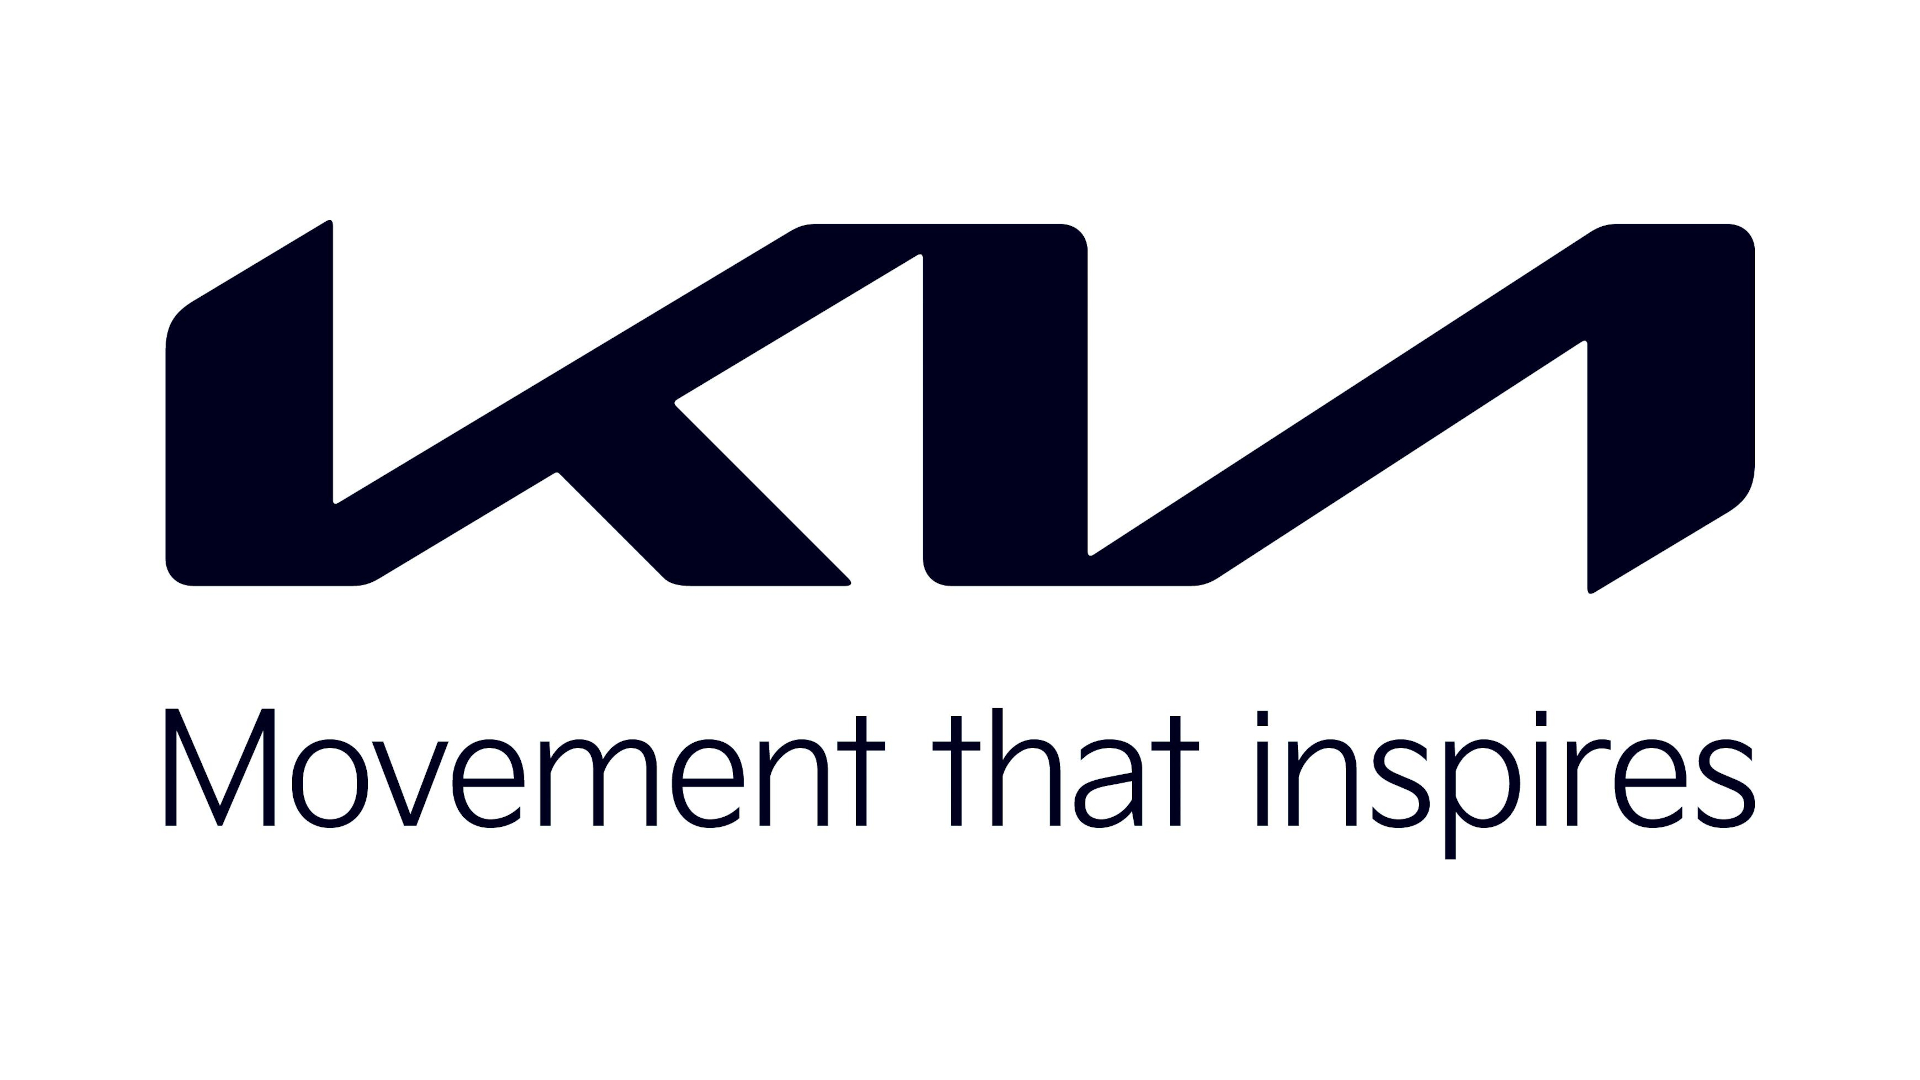 Kia unveils new logo as brand announces future mobility ambitions